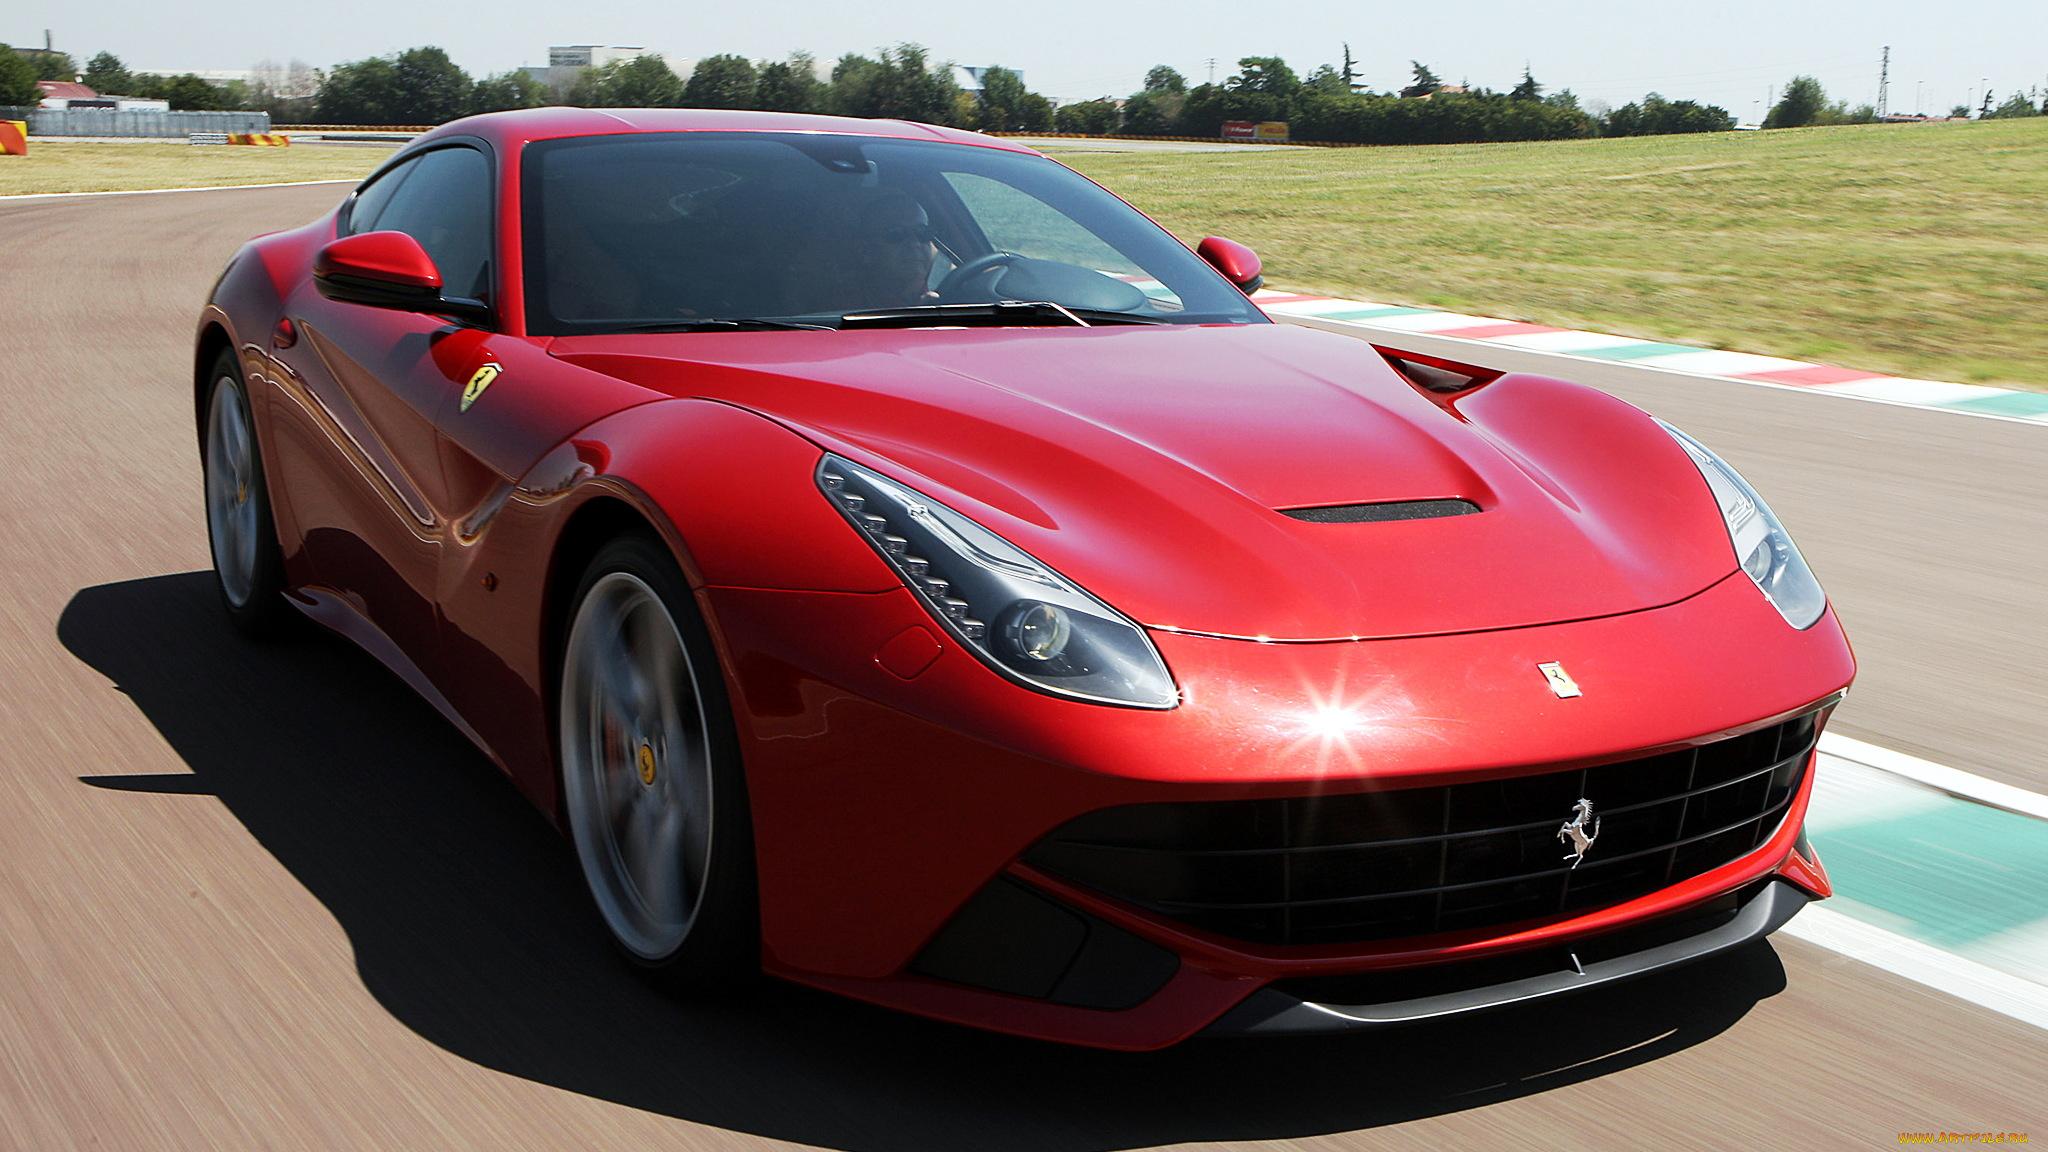 Ferrari F12 Berlinetta спорткар  № 553449 бесплатно